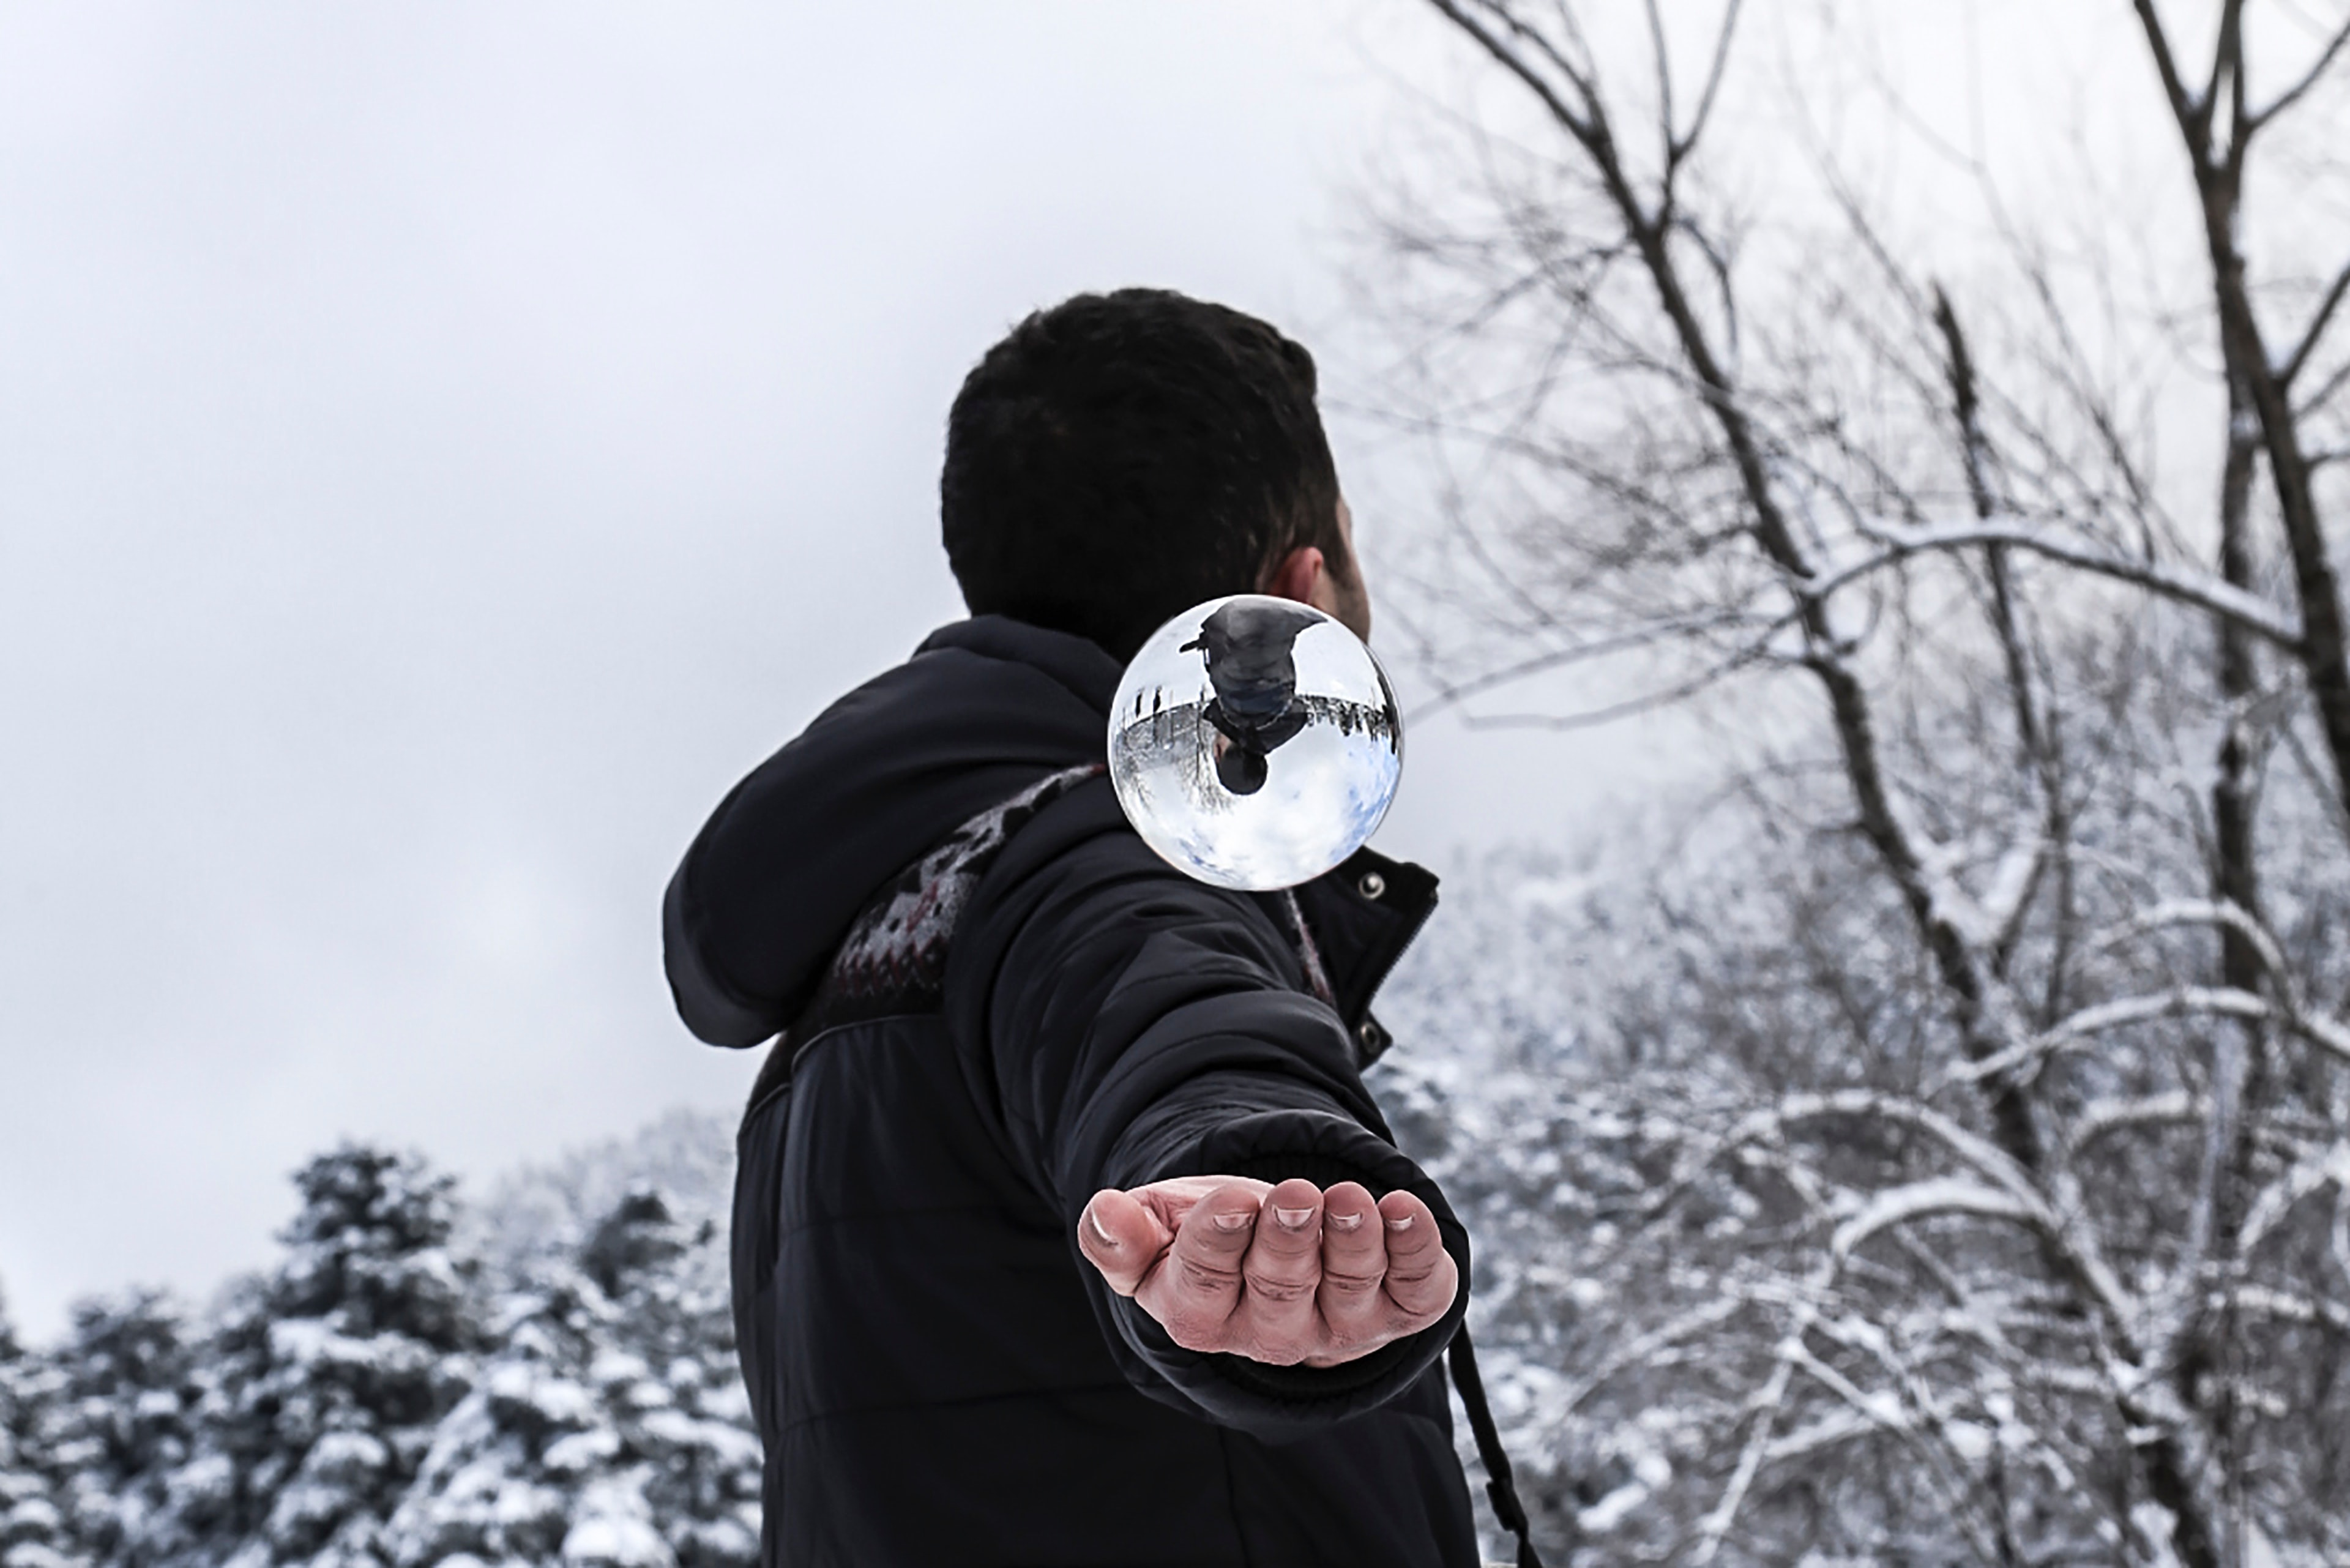 Man in black hoodie during snow weather at daytime photo